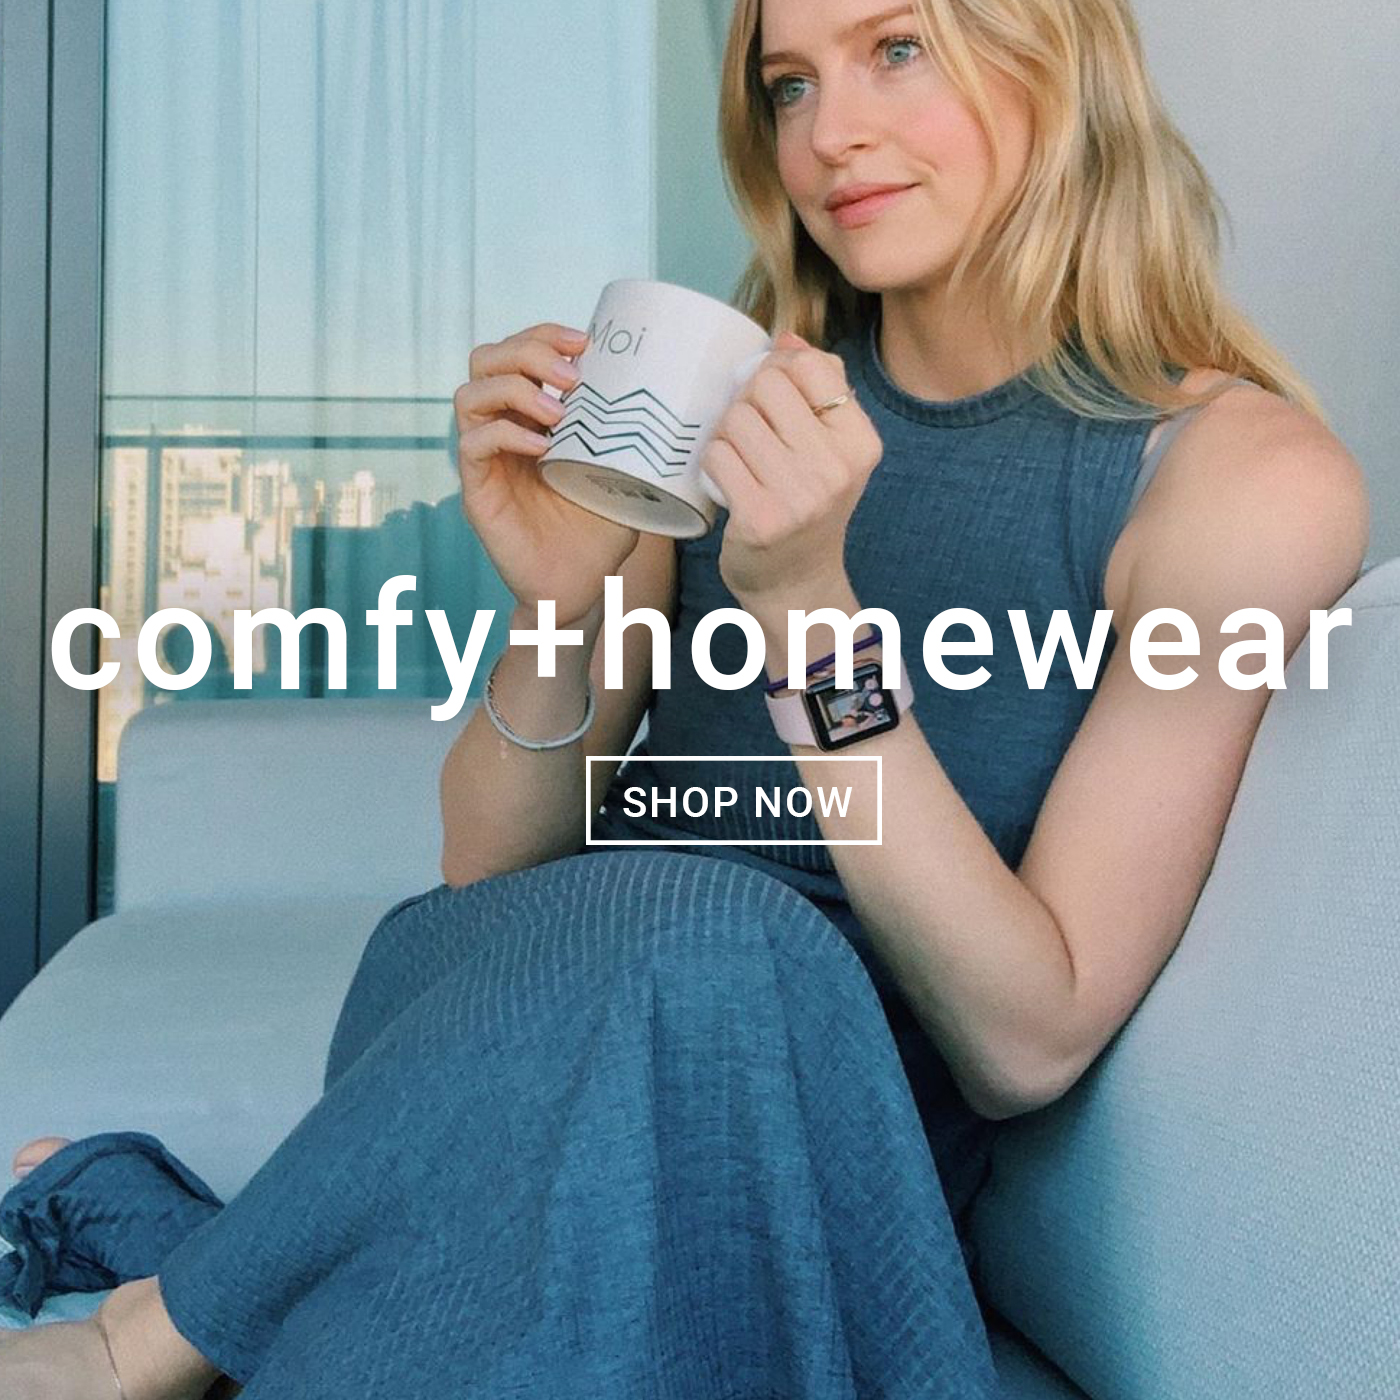 roupas comfy